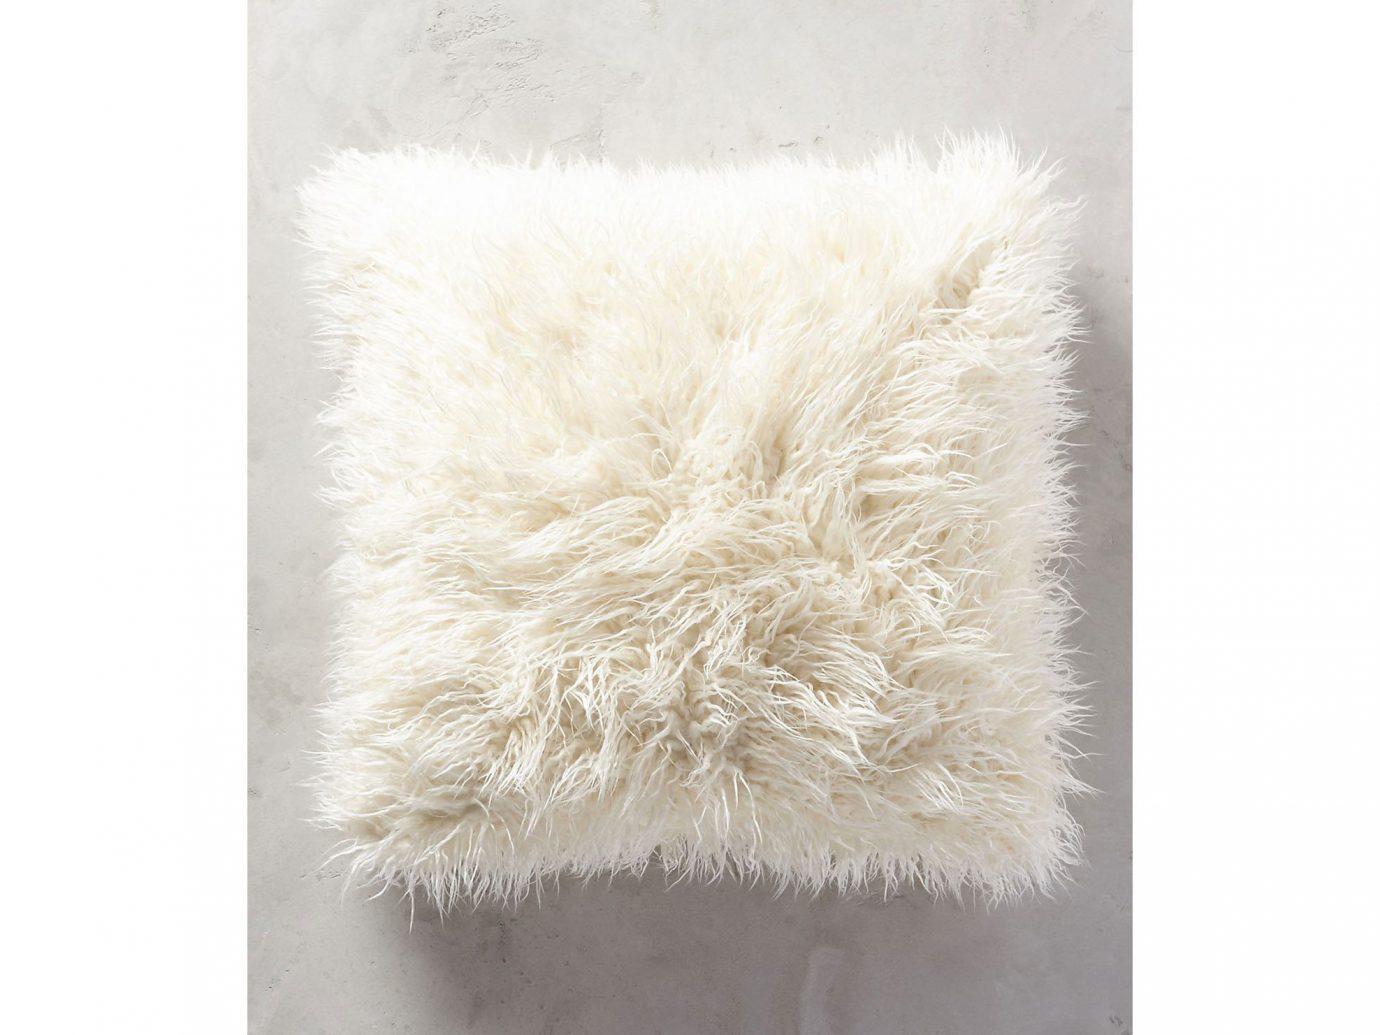 City Copenhagen Kyoto Marrakech Palm Springs Style + Design Travel Shop Tulum fur rug wool cushion feather pillow